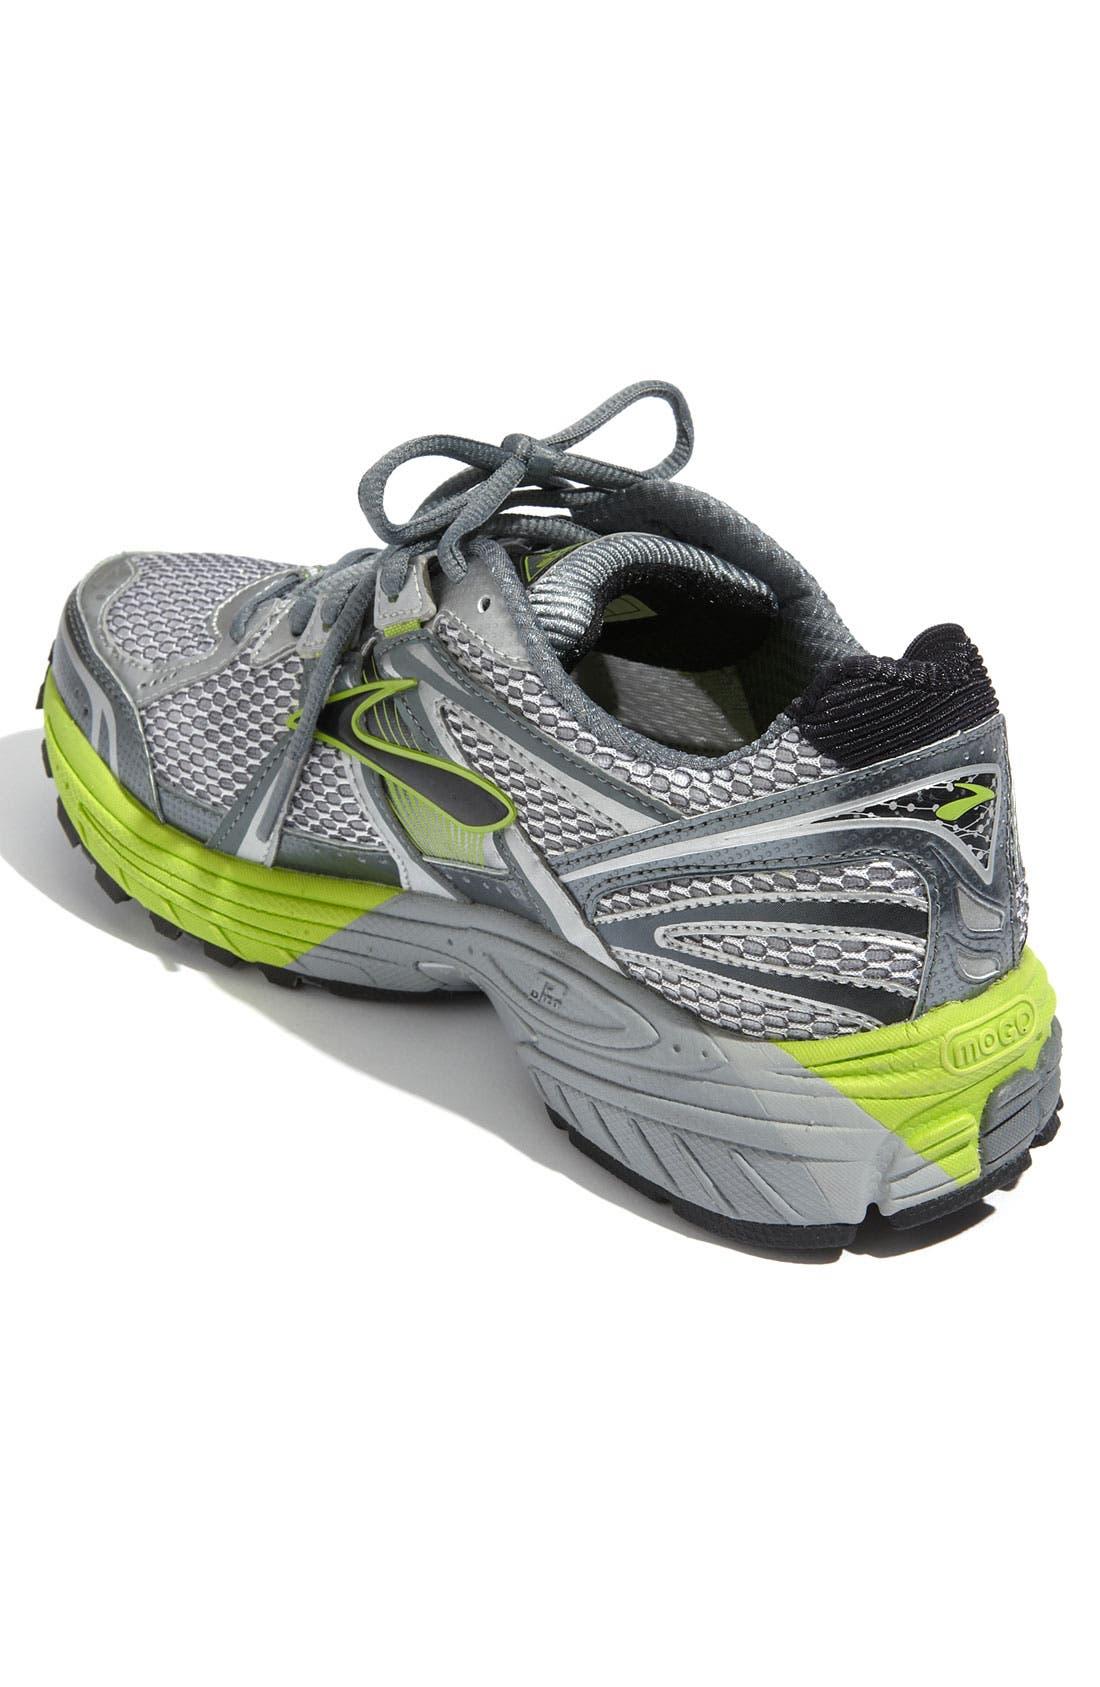 Alternate Image 2  - Brooks 'Adrenaline GTS 12' Running Shoe (Men)